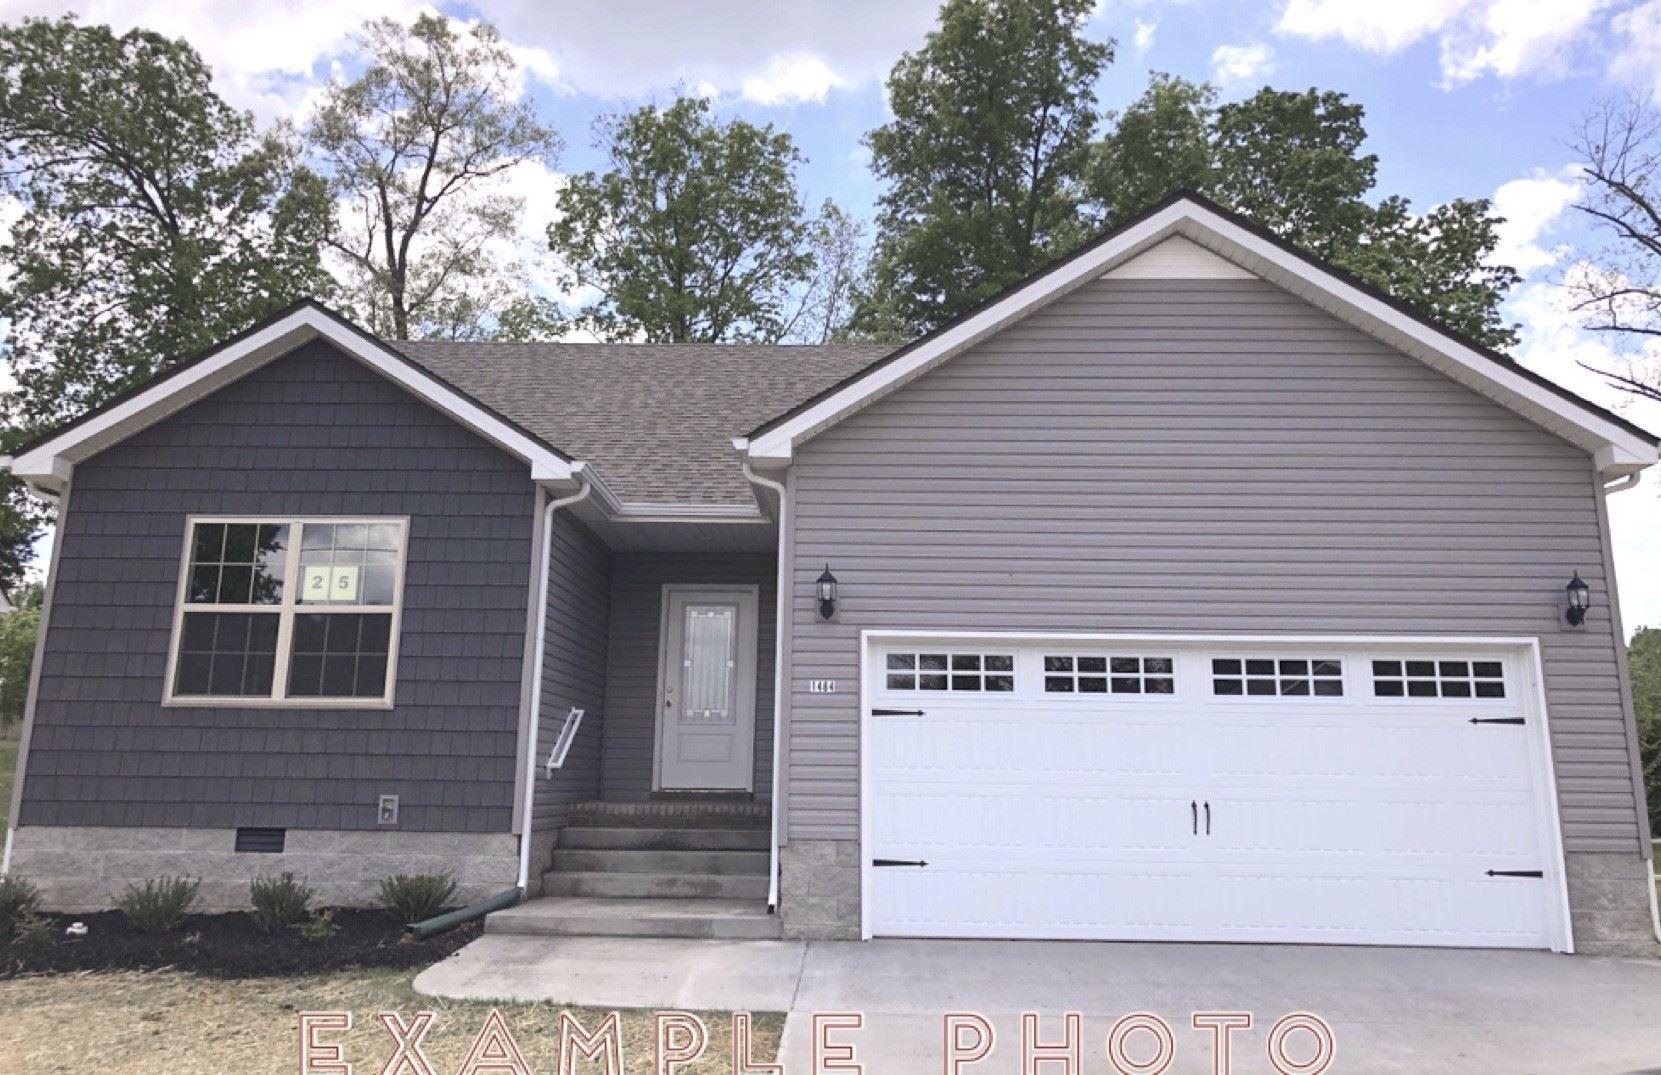 140 Camelot Hills, Clarksville, TN 37040 - MLS#: 2188337